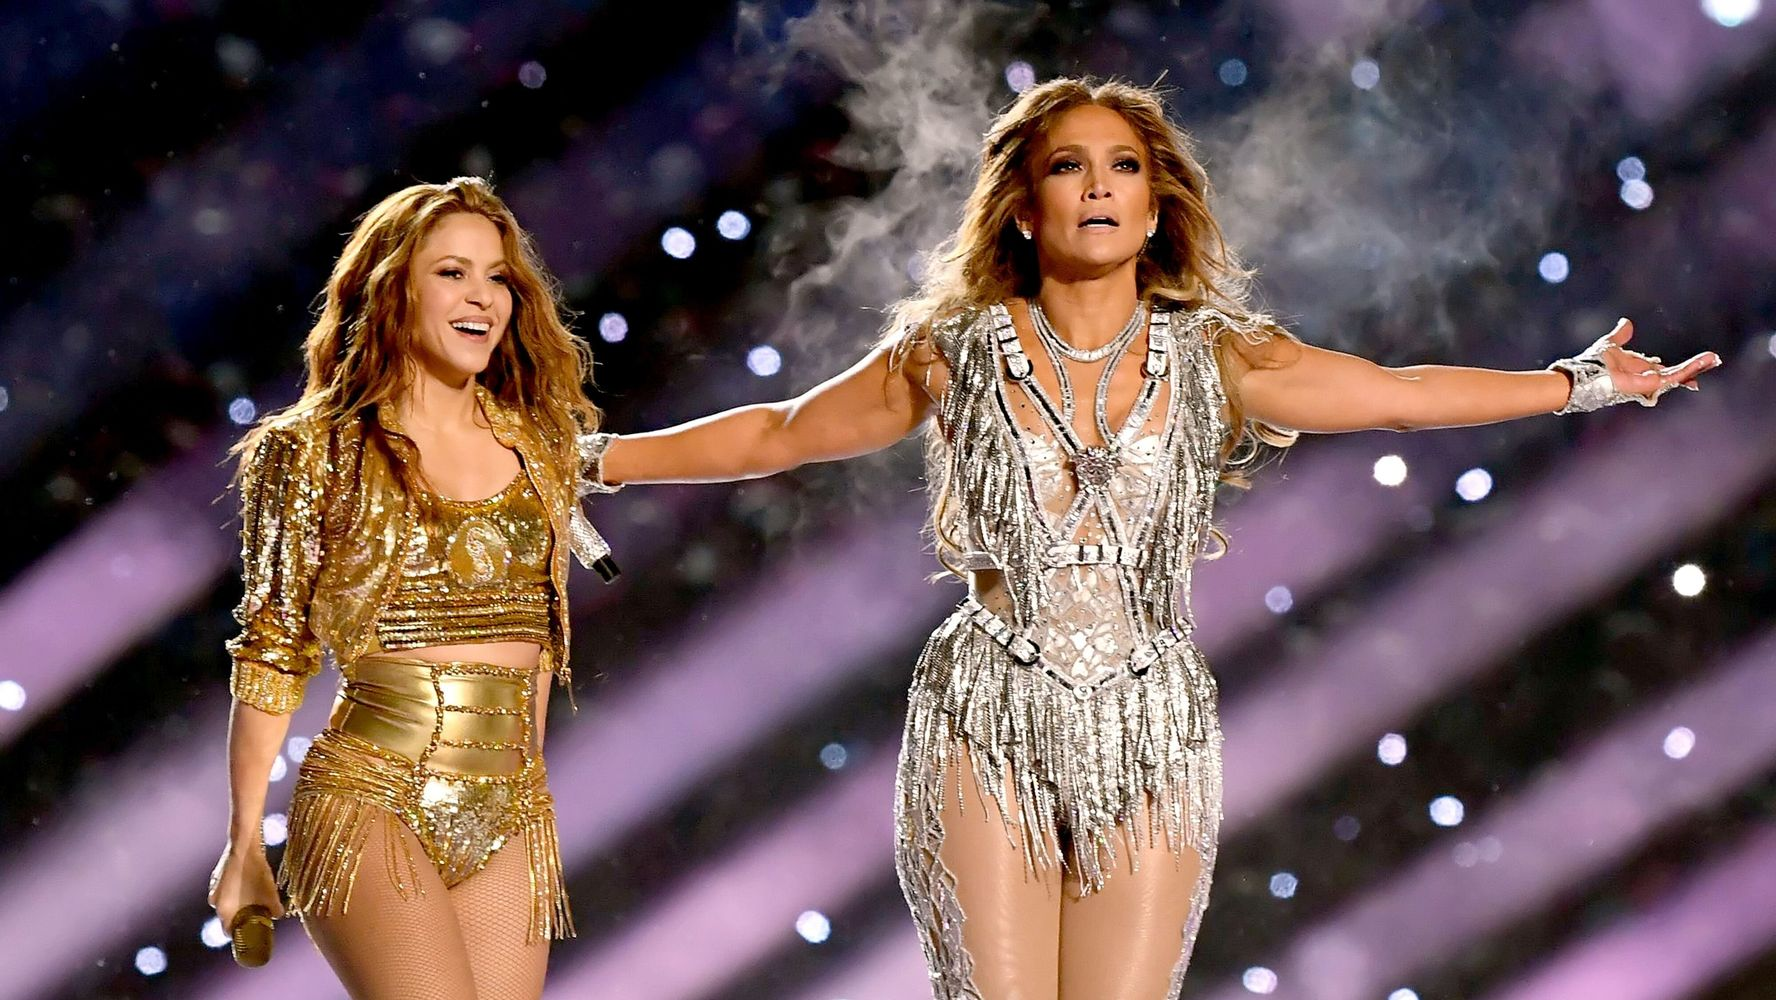 Westlake Legal Group 5e377956230000f9066ec451 Jennifer Lopez And Shakira Bring The Heat In Killer Super Bowl Halftime Show